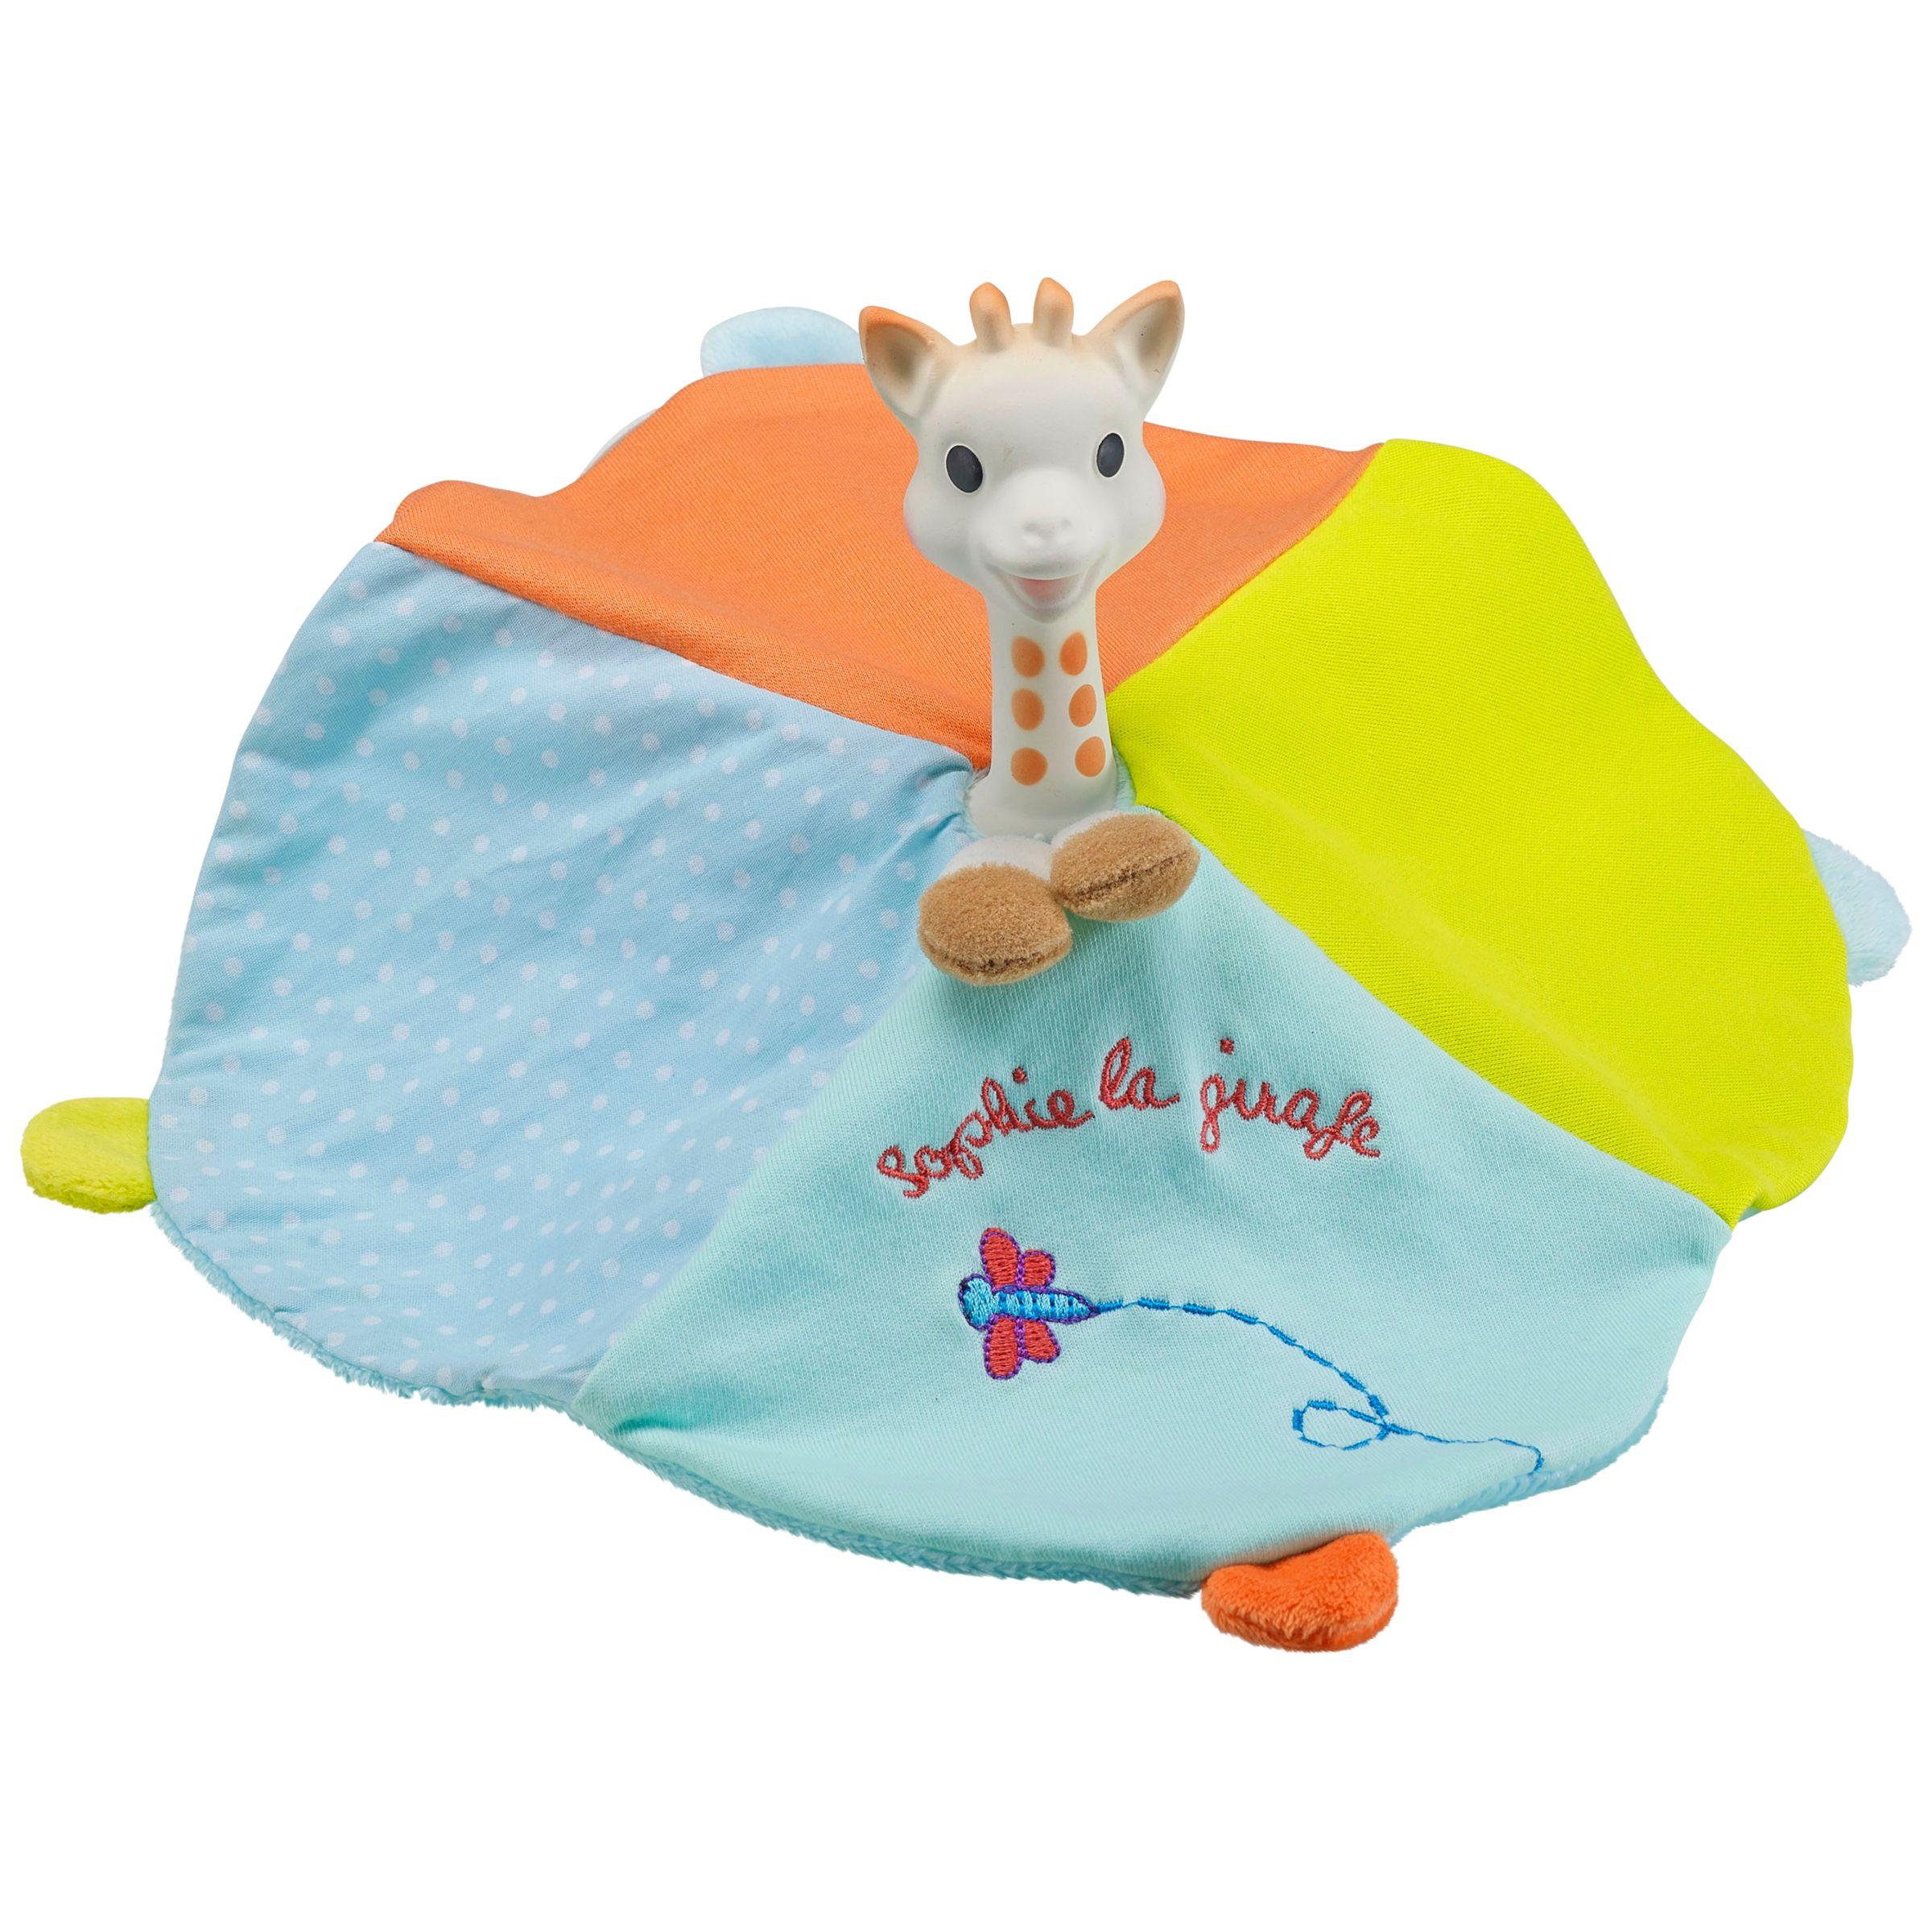 Sophie la Girafe Sophie la Girafe Baby Teether and Comforter